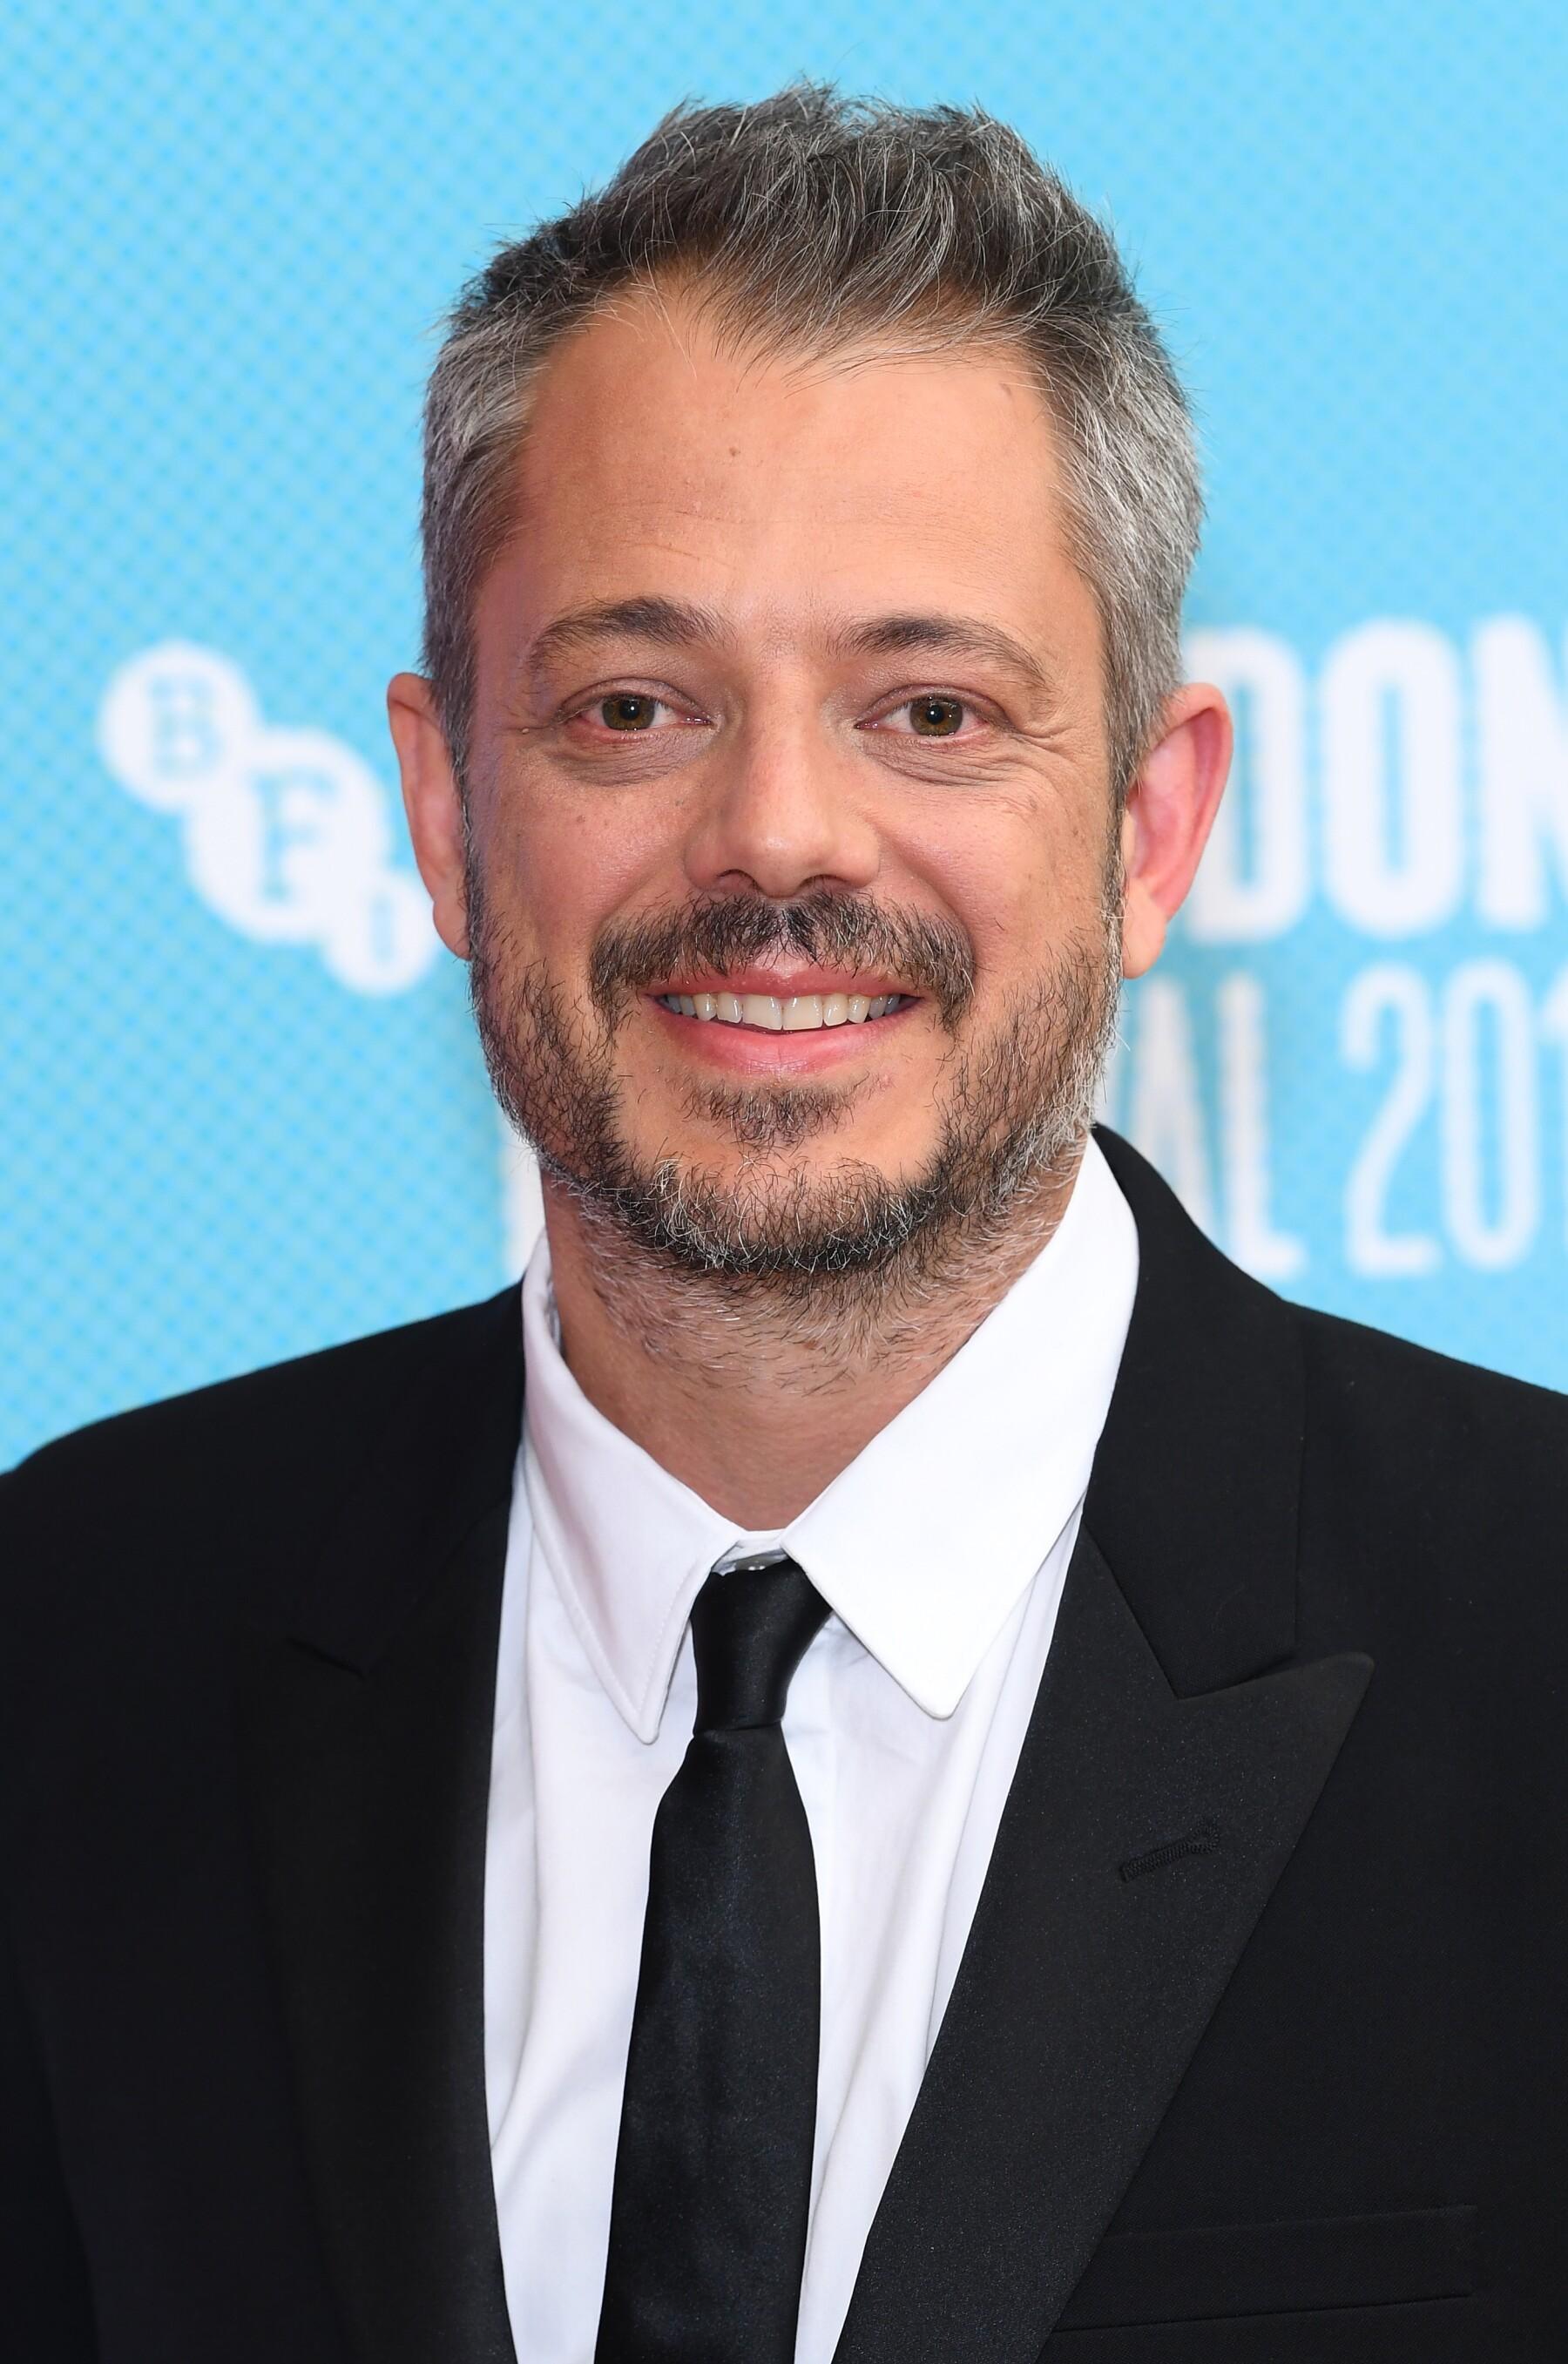 'Seberg' premiere, BFI London Film Festival, UK - 04 Oct 2019